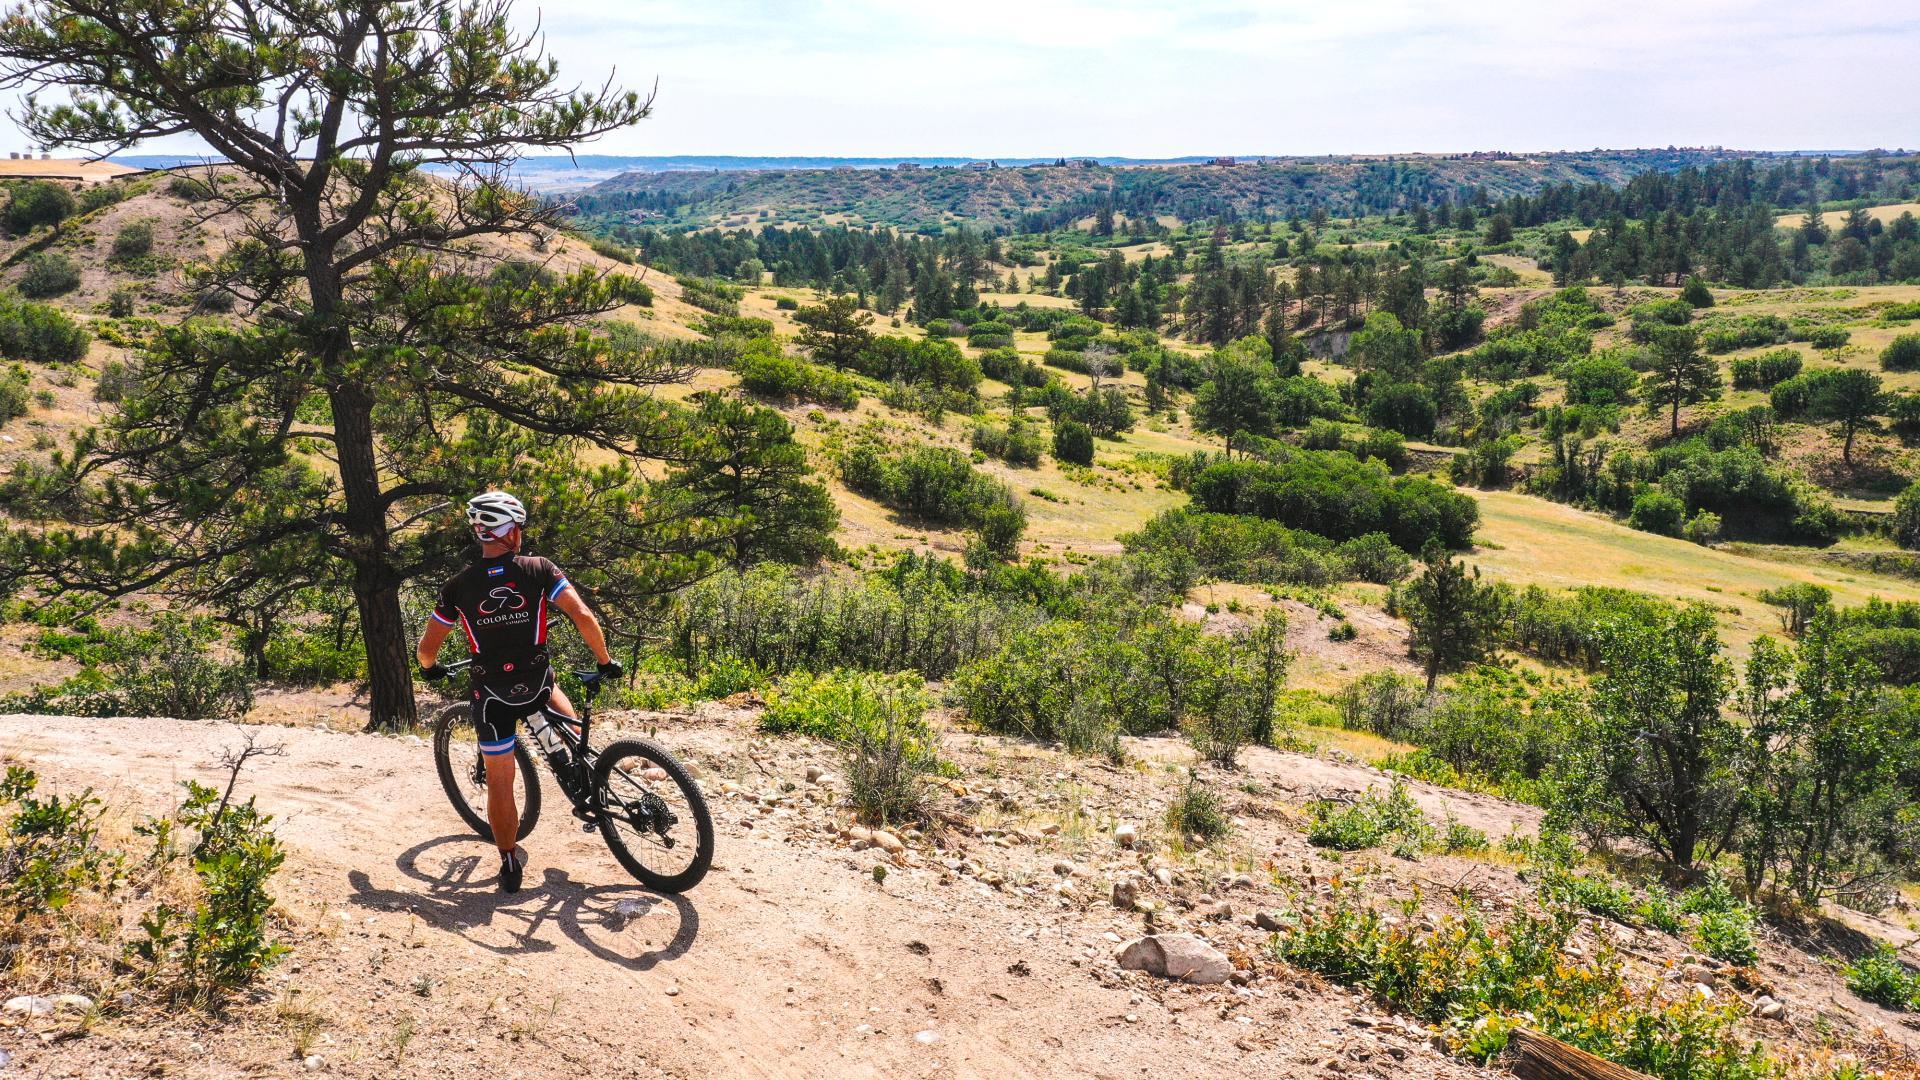 Explore miles of trails throughout Douglas county